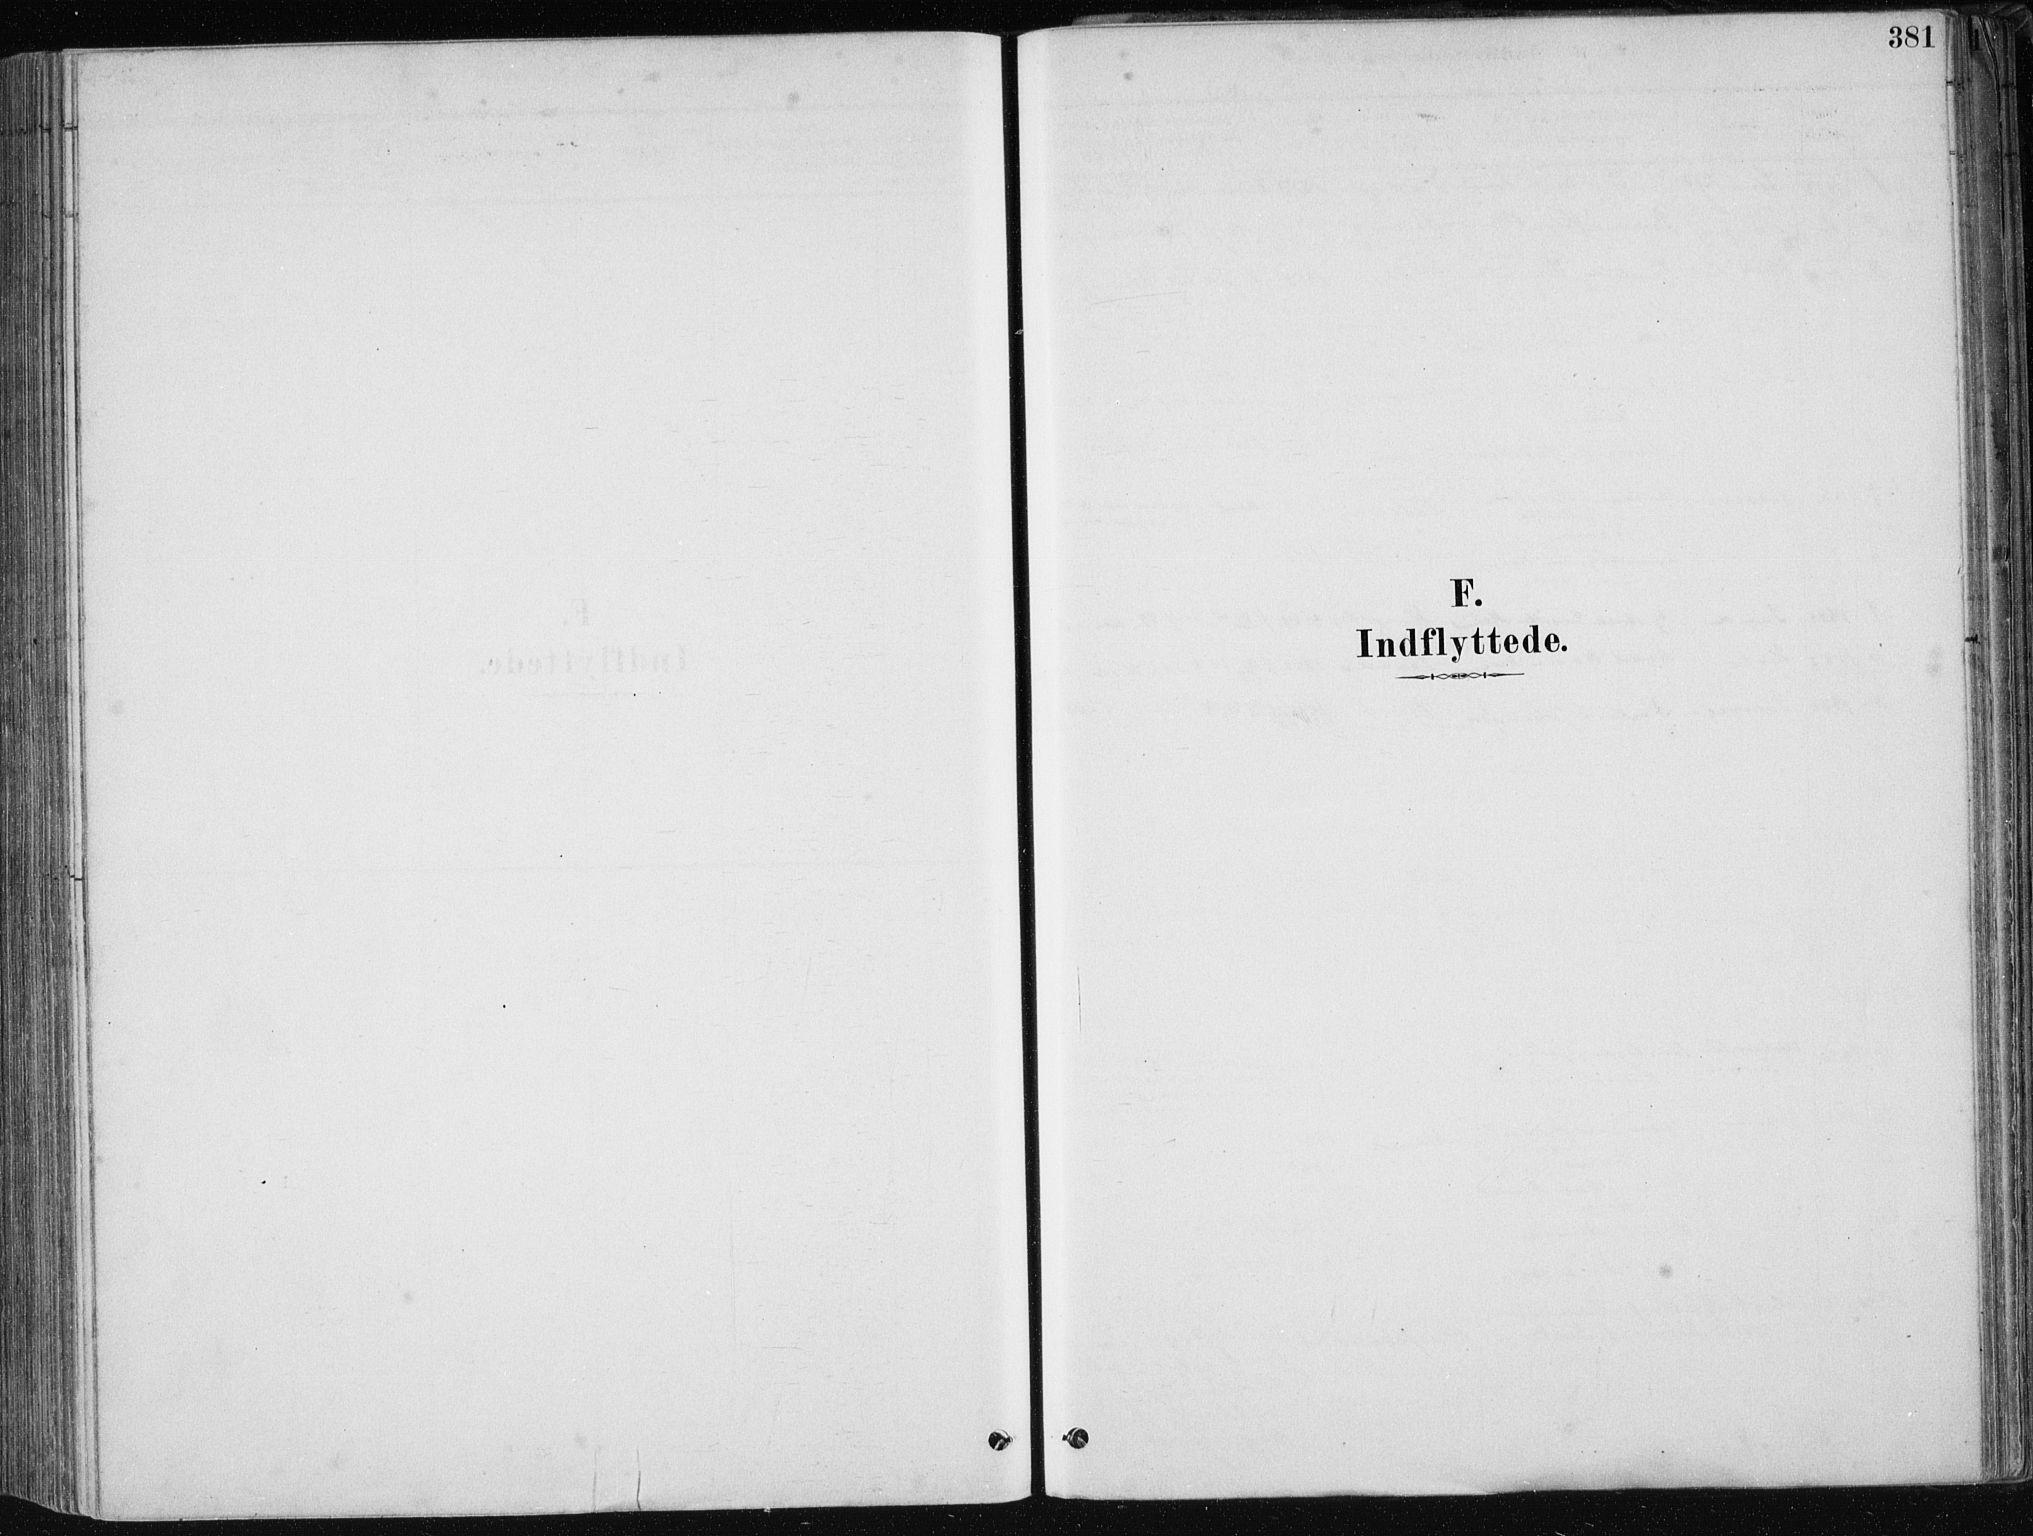 SAB, Fjell sokneprestembete, H/Haa: Parish register (official) no. A  8, 1878-1898, p. 381